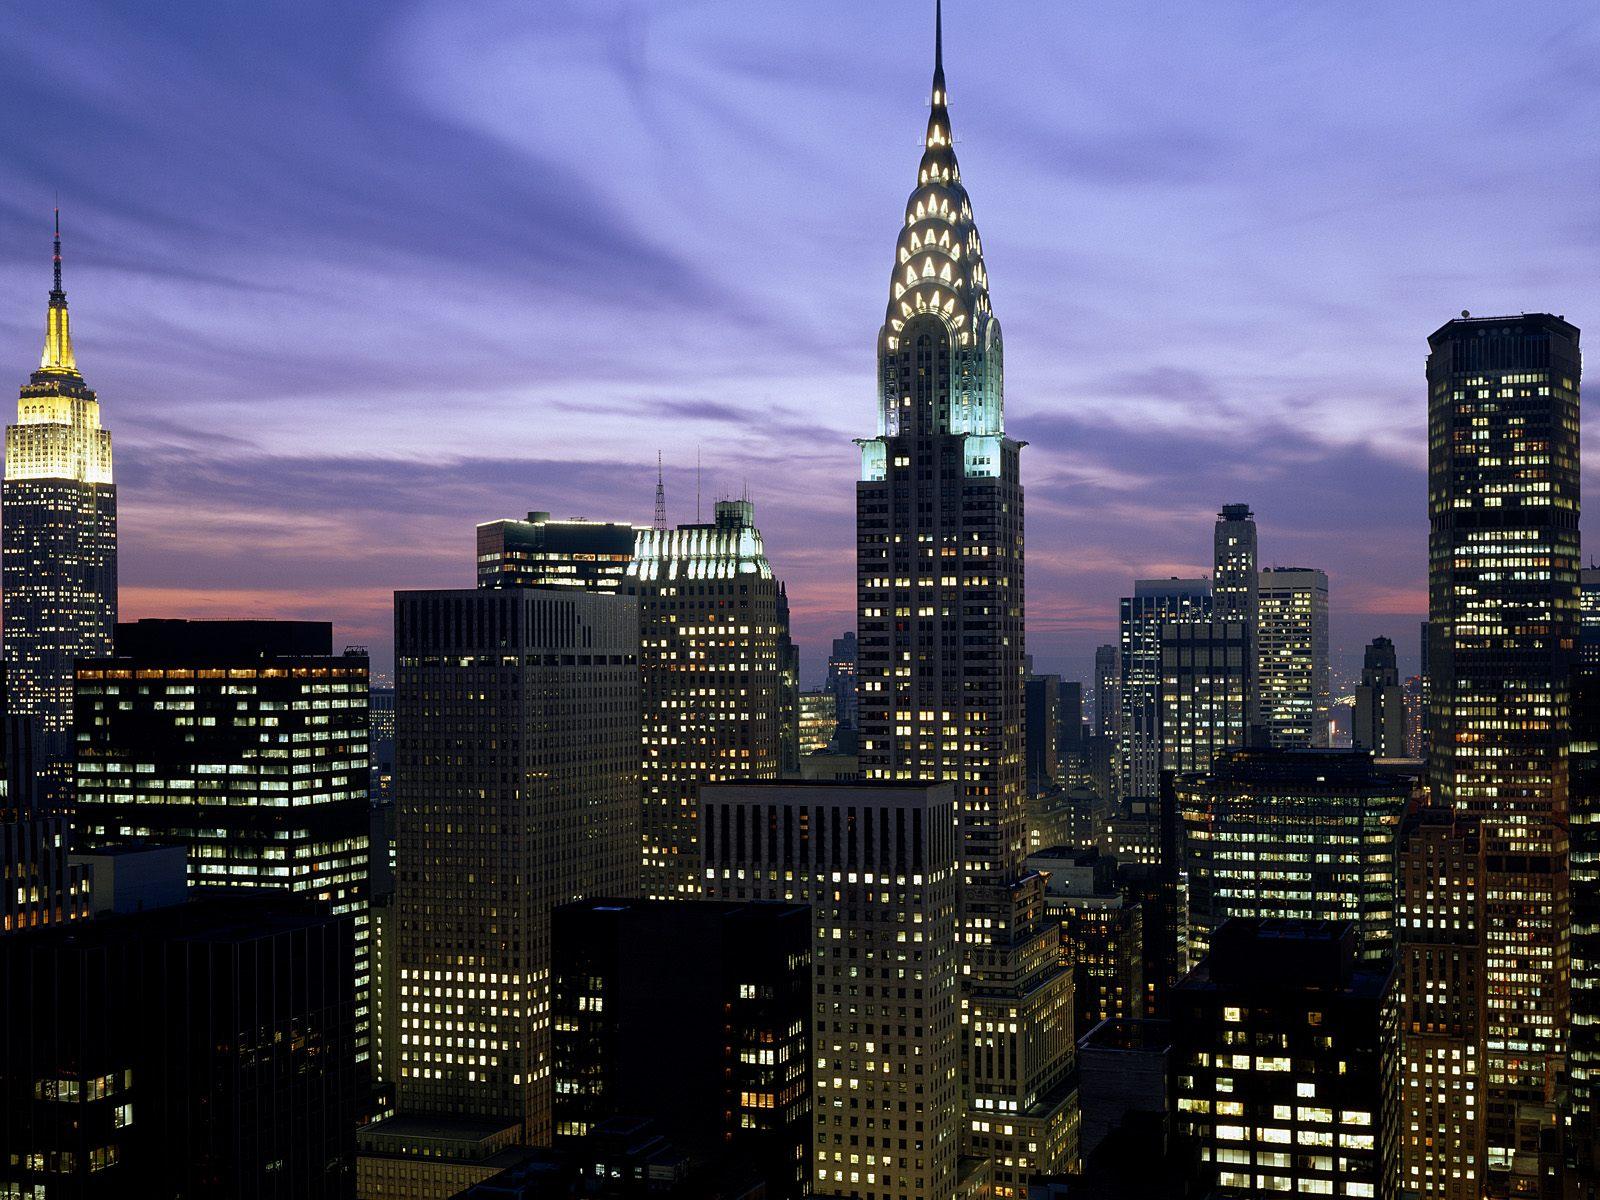 http://3.bp.blogspot.com/-CyfhGLqI6vo/T8xqaEsH7JI/AAAAAAAABfc/V_L3eRyLWcA/s1600/nyc,new+york+city,usa,central+park+%2817%29.jpg